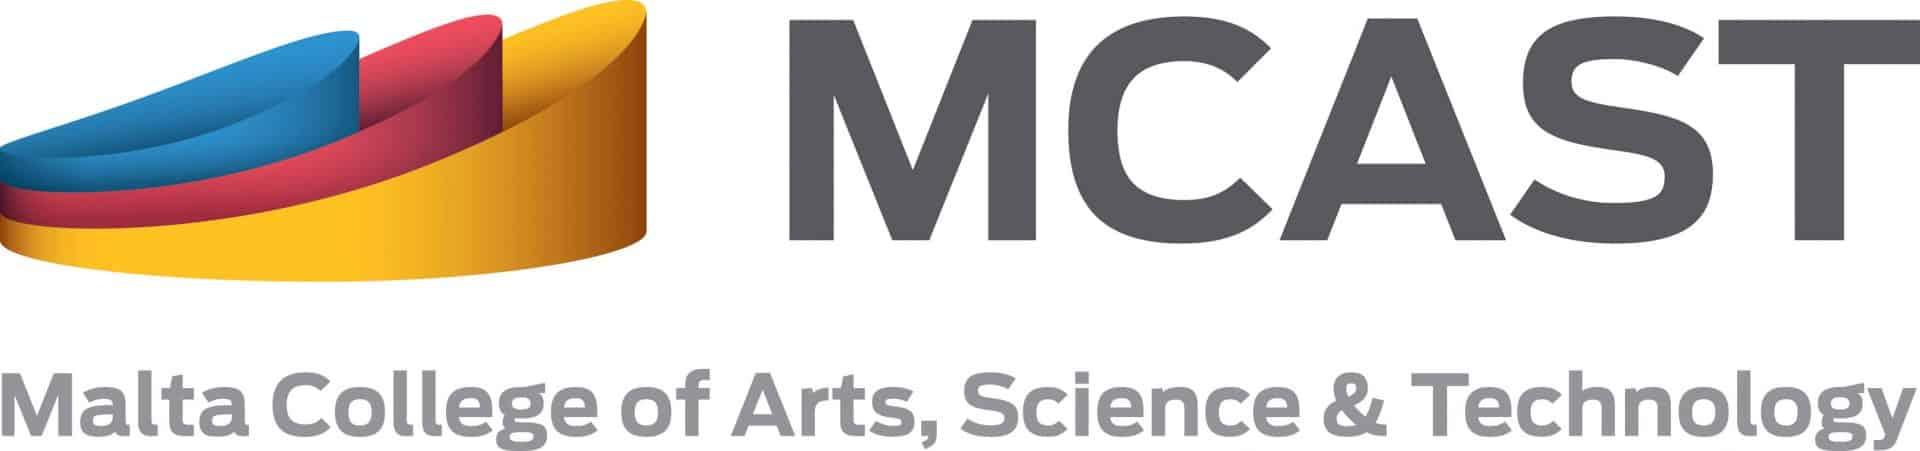 Malta College of Arts, science & technology logo